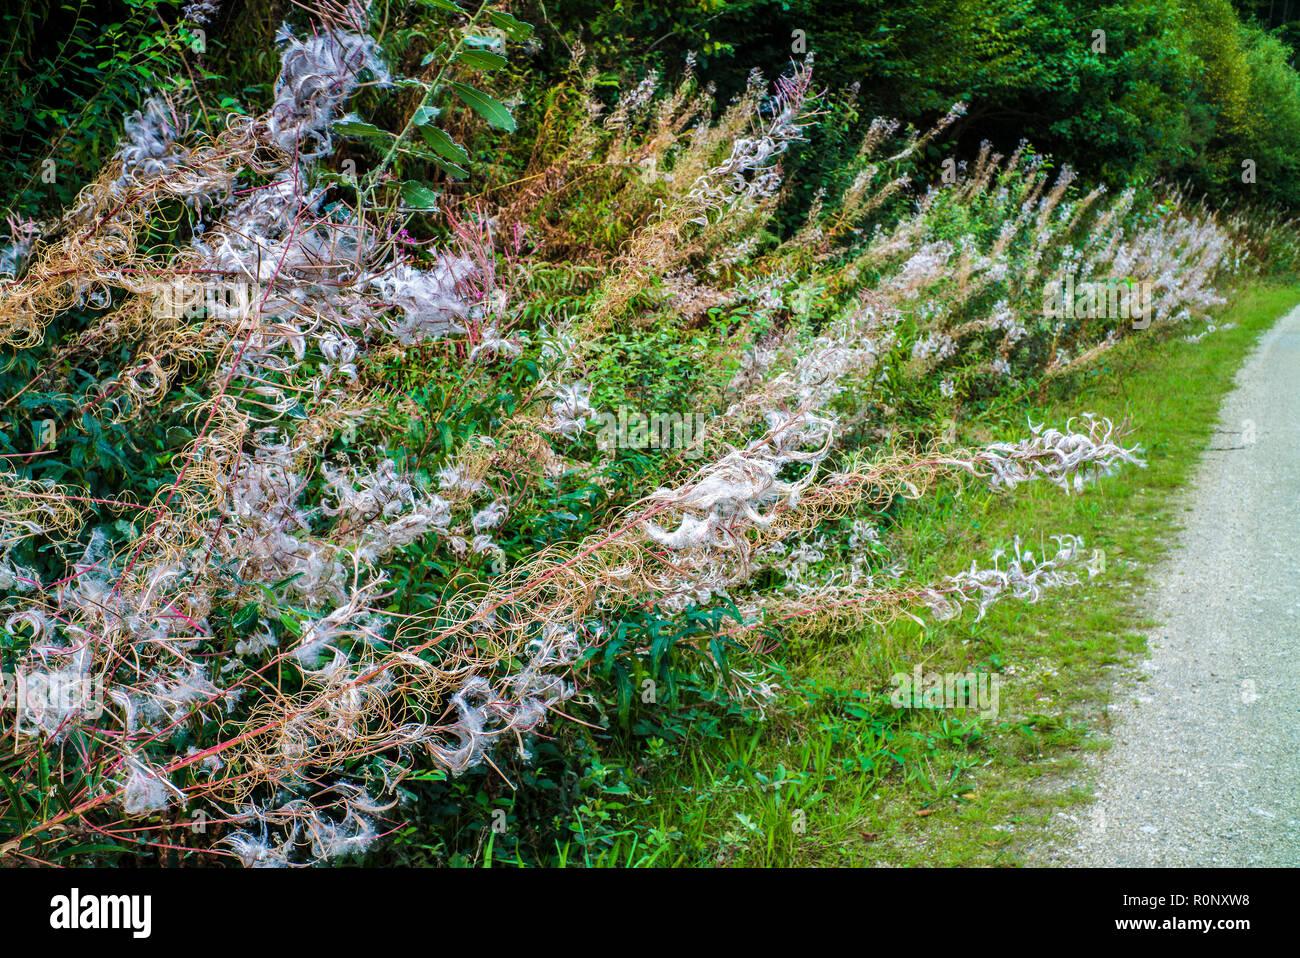 Fireweed, Rosebay willow-herb, Great willow-herb (Epilobium angustifolium, Chamerion angustifolium), growing wild beside counrty path Stock Photo